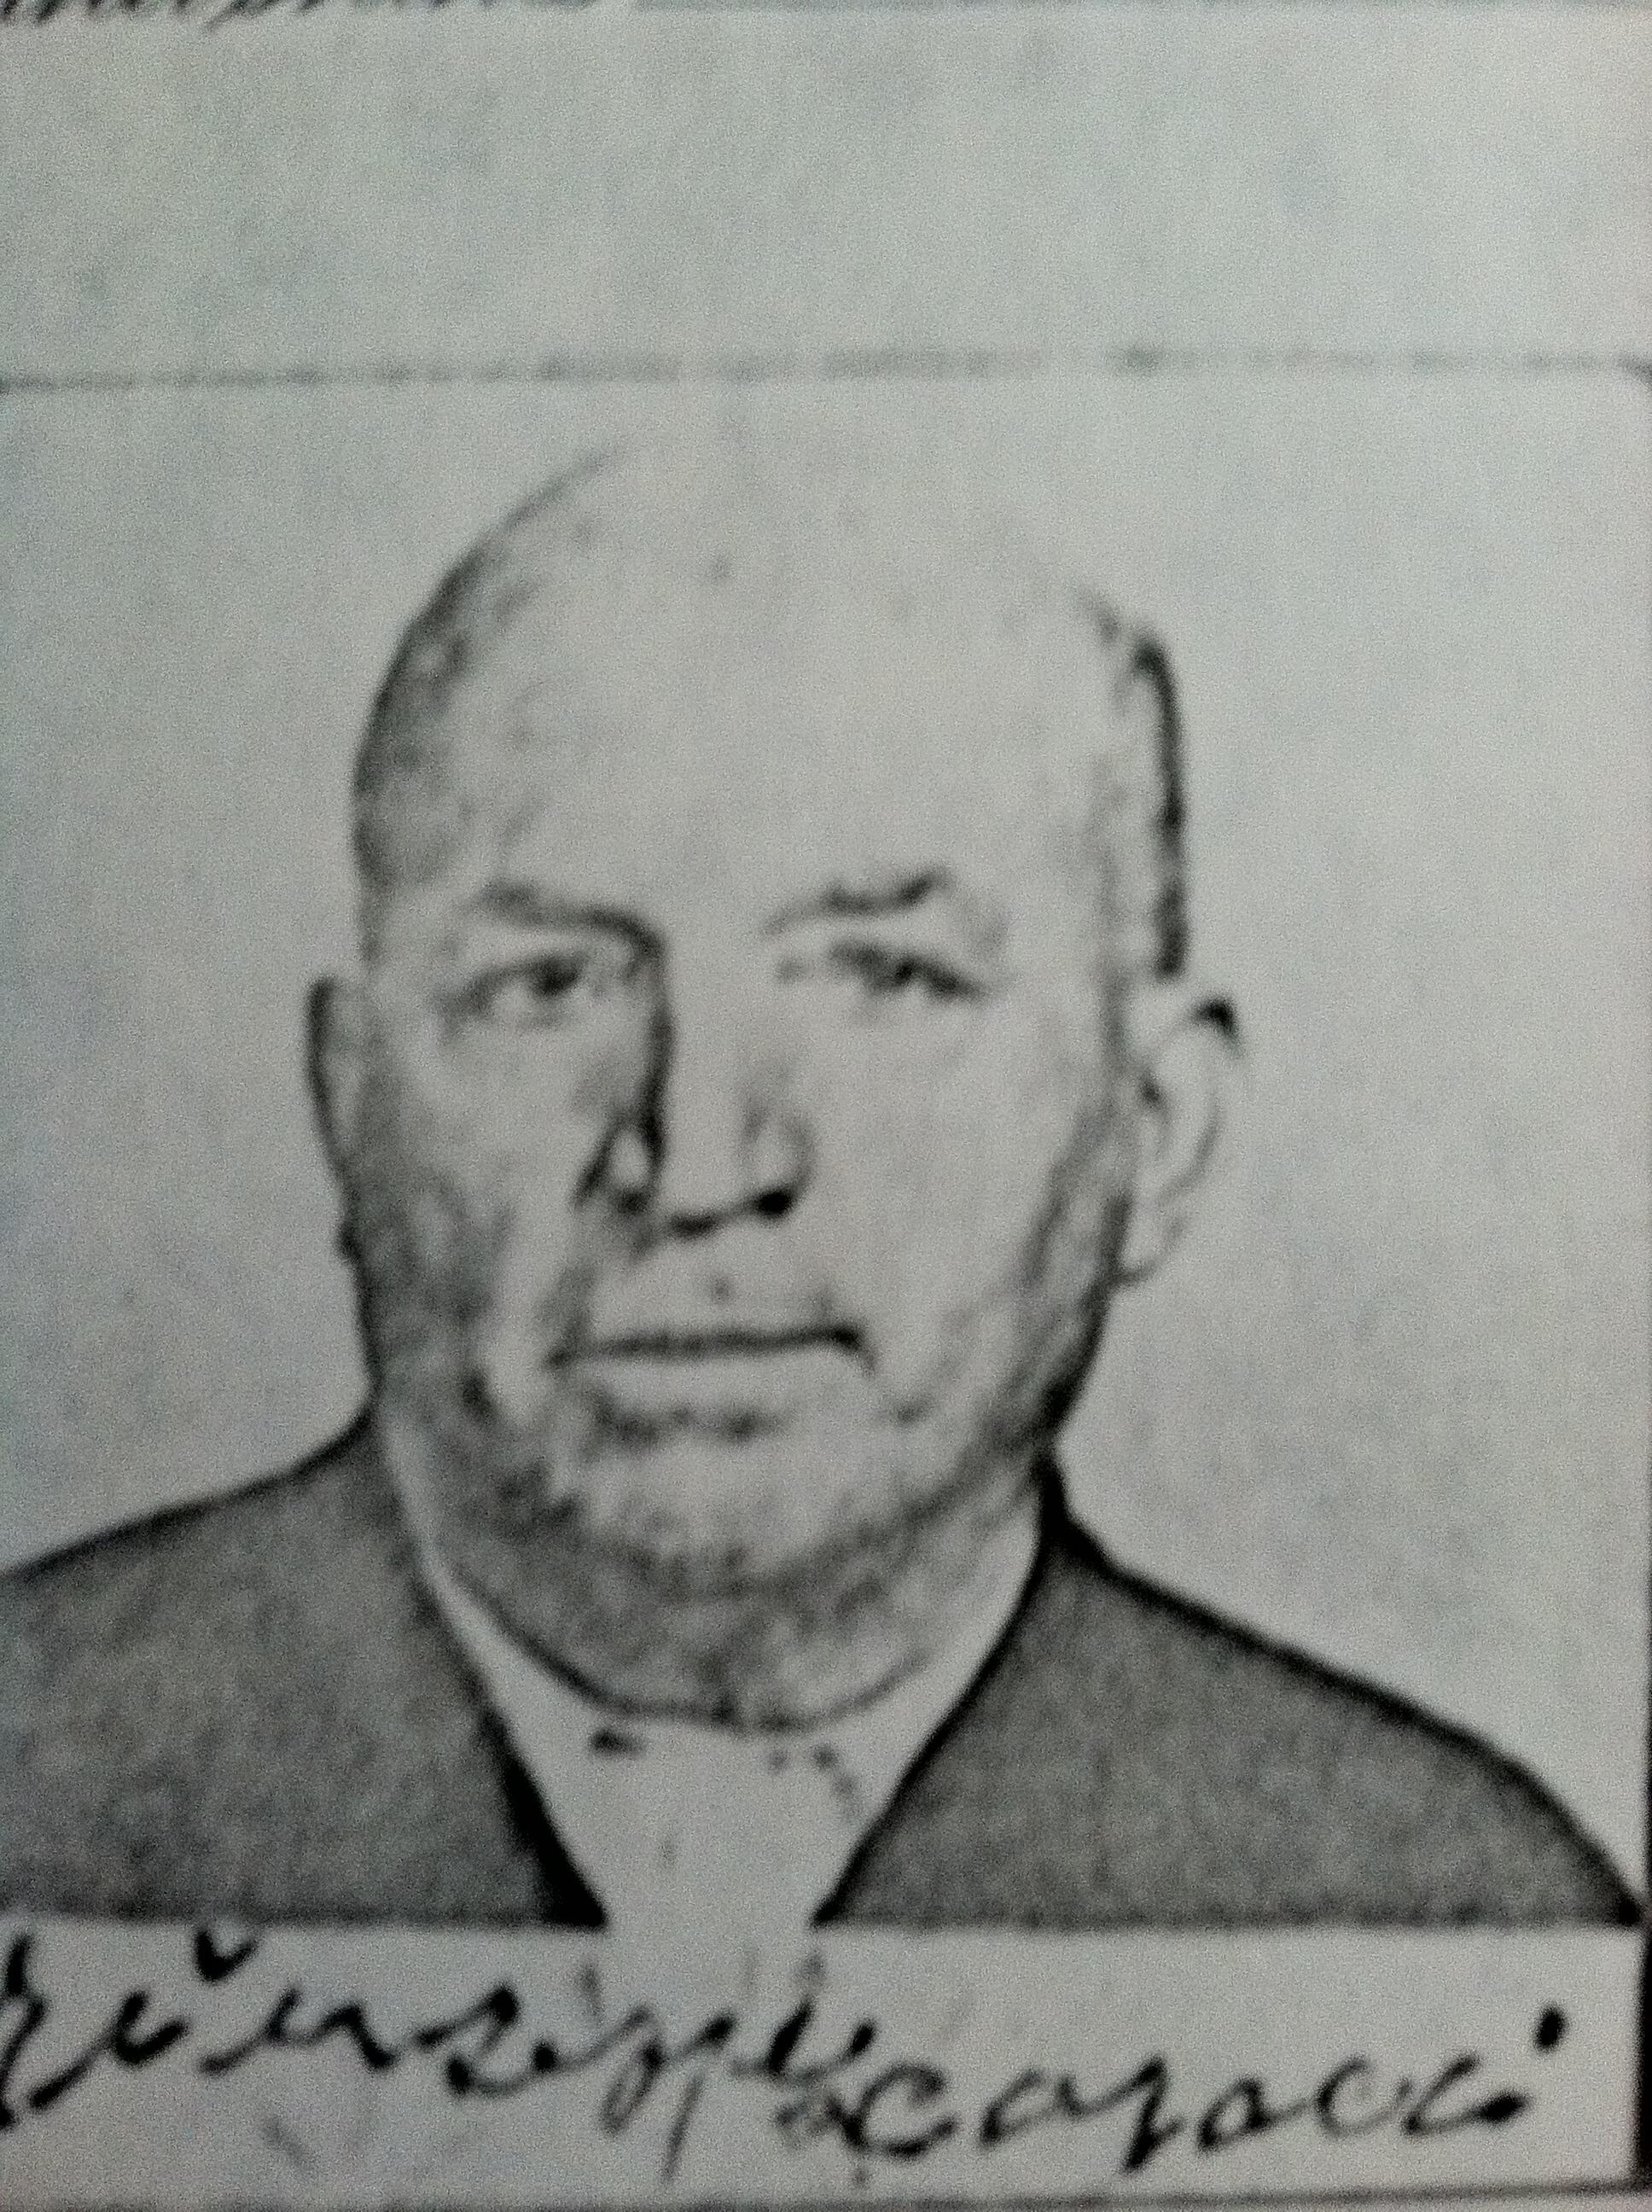 Frank Joseph Caracci